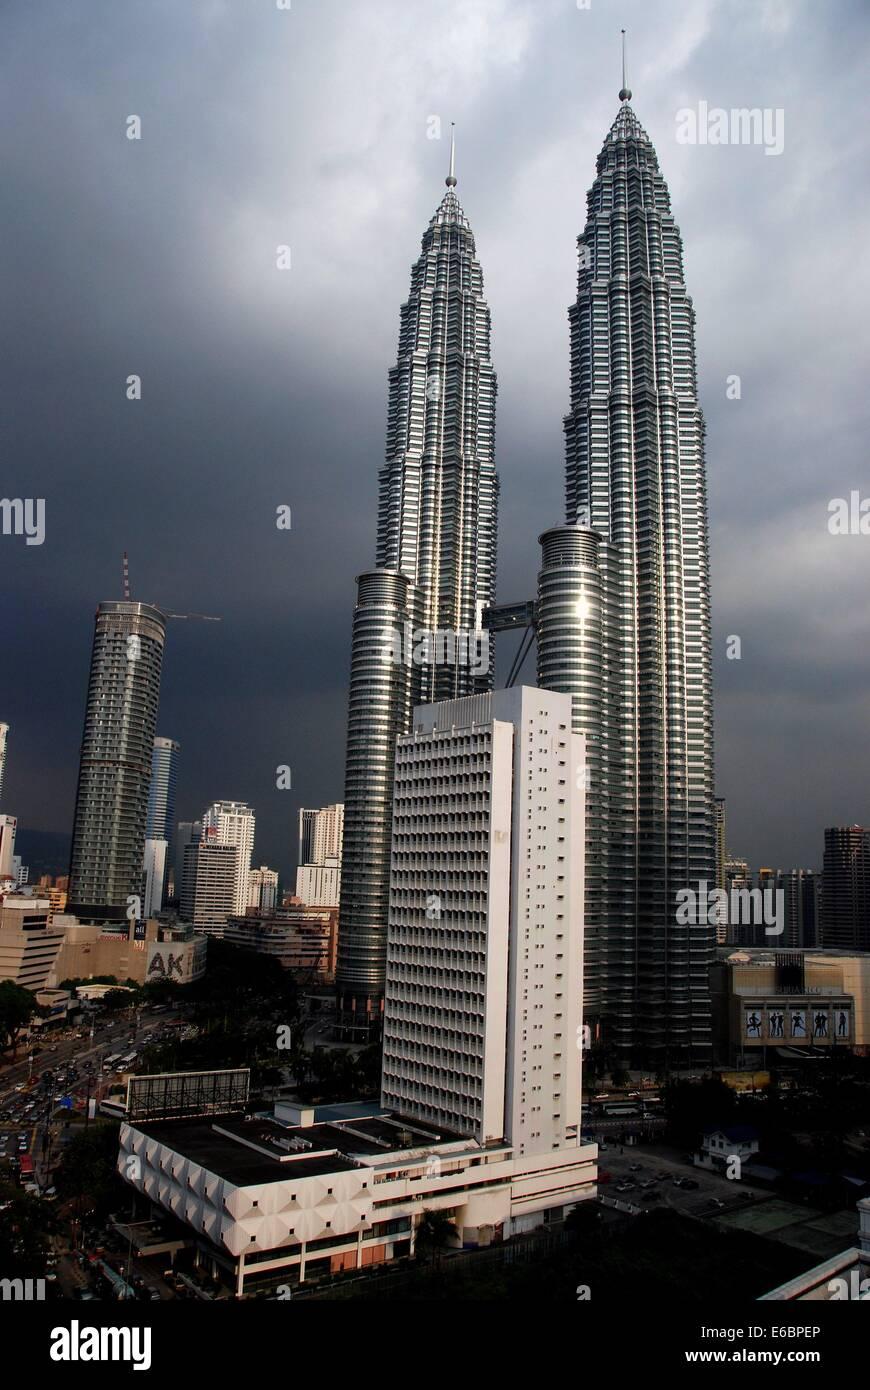 KUALA LUMPUR, MALAYSIA: The magnificent Petronas Towers